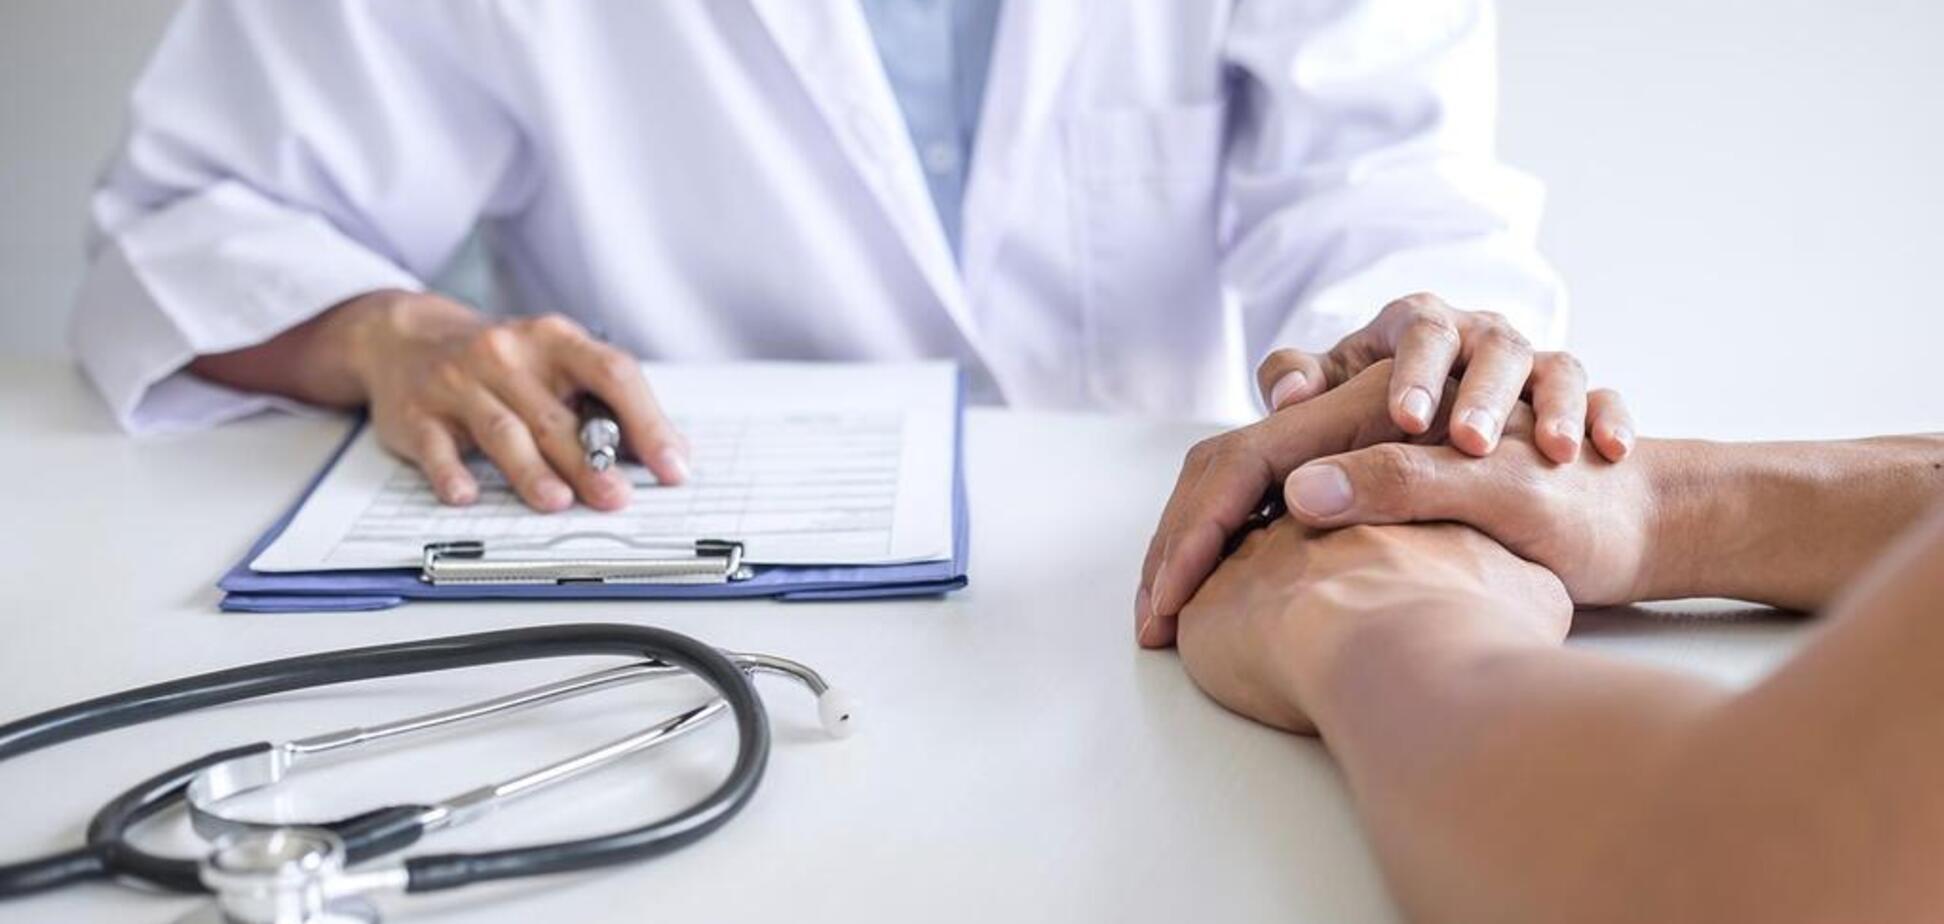 Пациентский экстремизм: кто защитит врача?